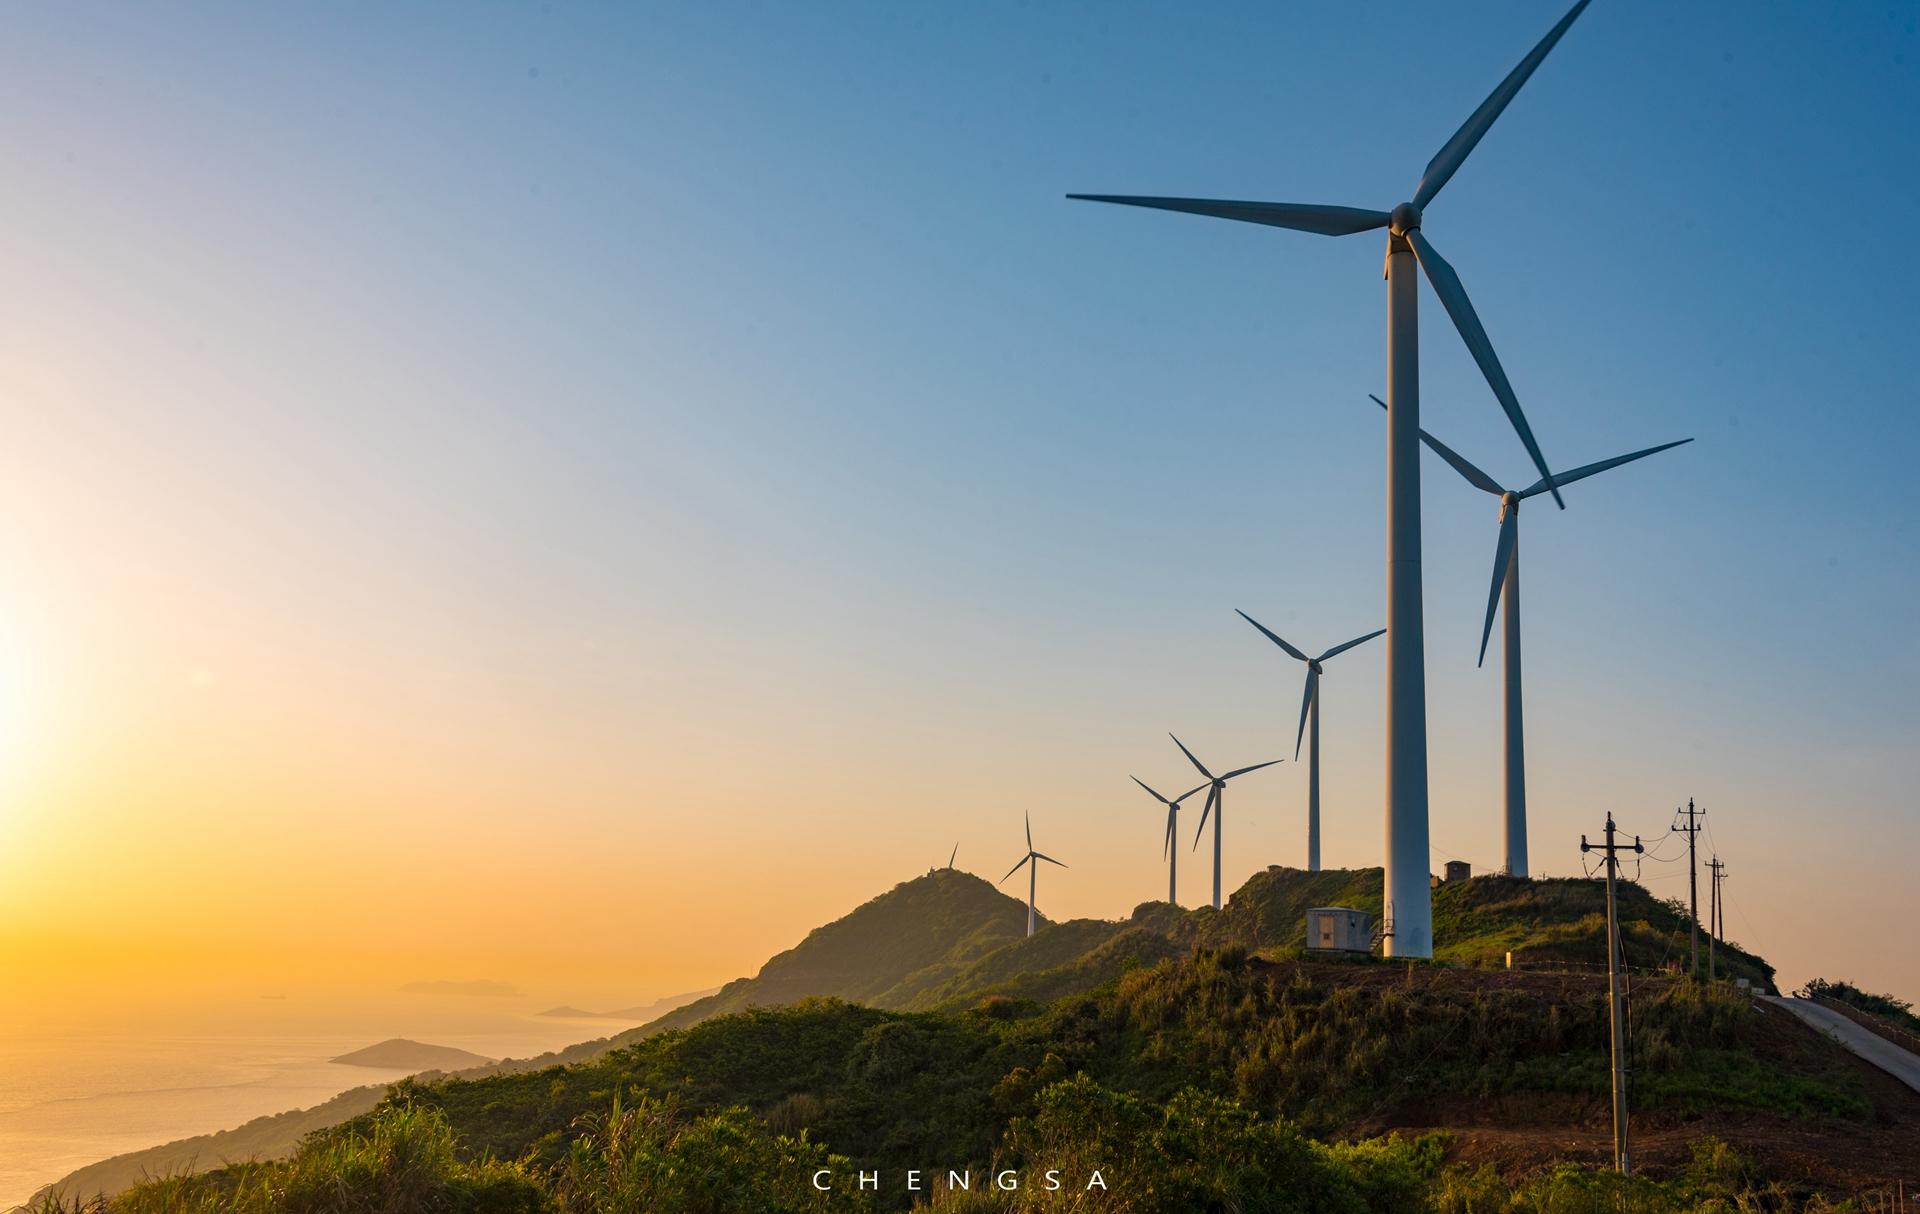 Wind Turbine viewing platform, China